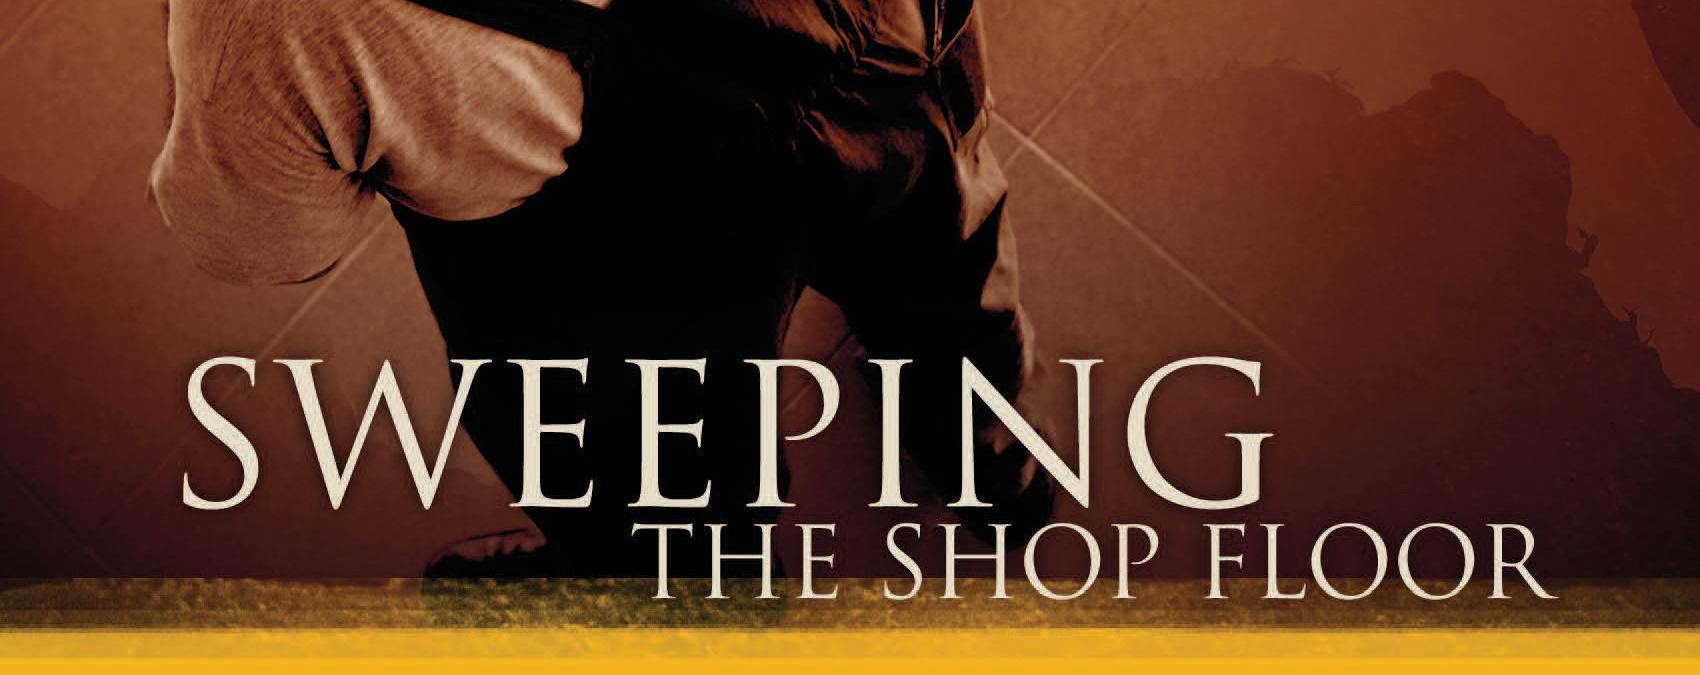 sweeping-the-shop-floor-FEATURED.jpg